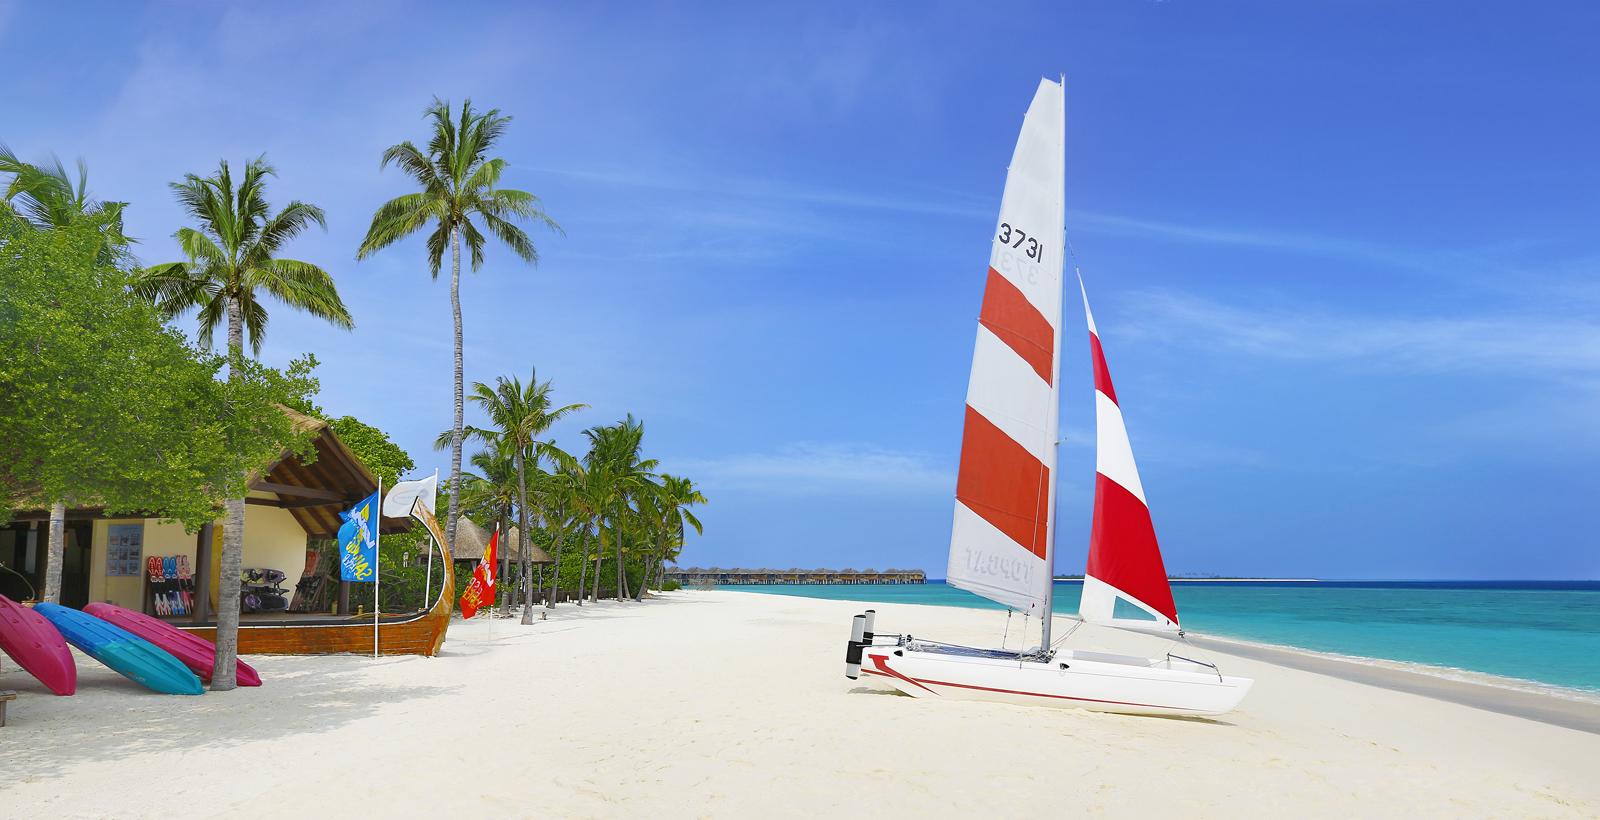 Celebrate a tropical festive season and JA Manafaru Maldives